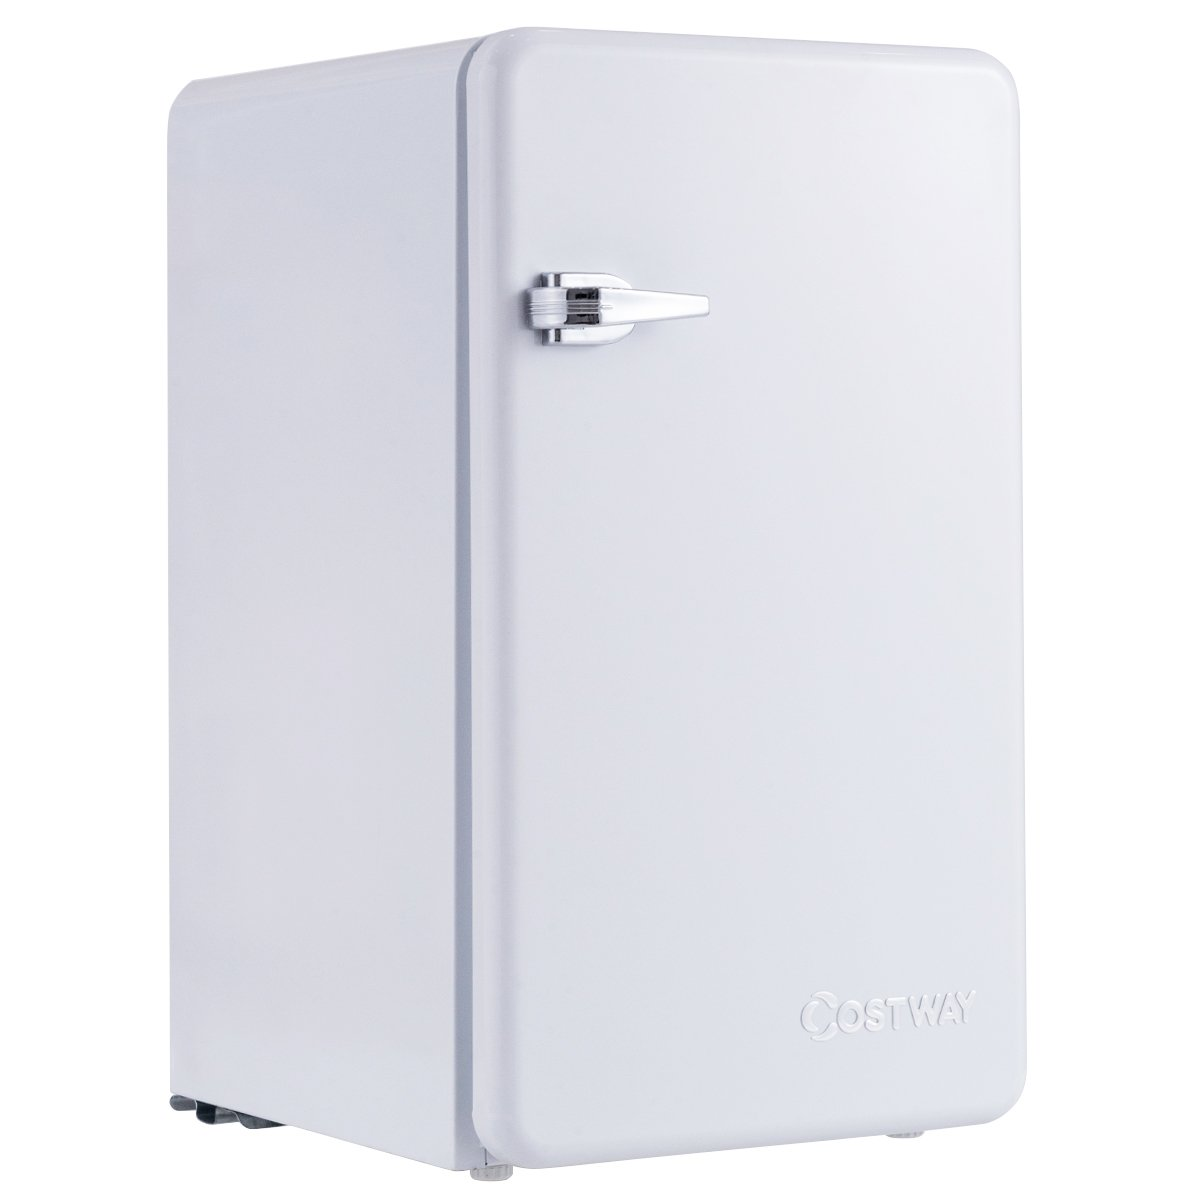 Amazon.com: Daewoo Retro Compact Refrigerator, 2.8 cu. ft., Mint ...